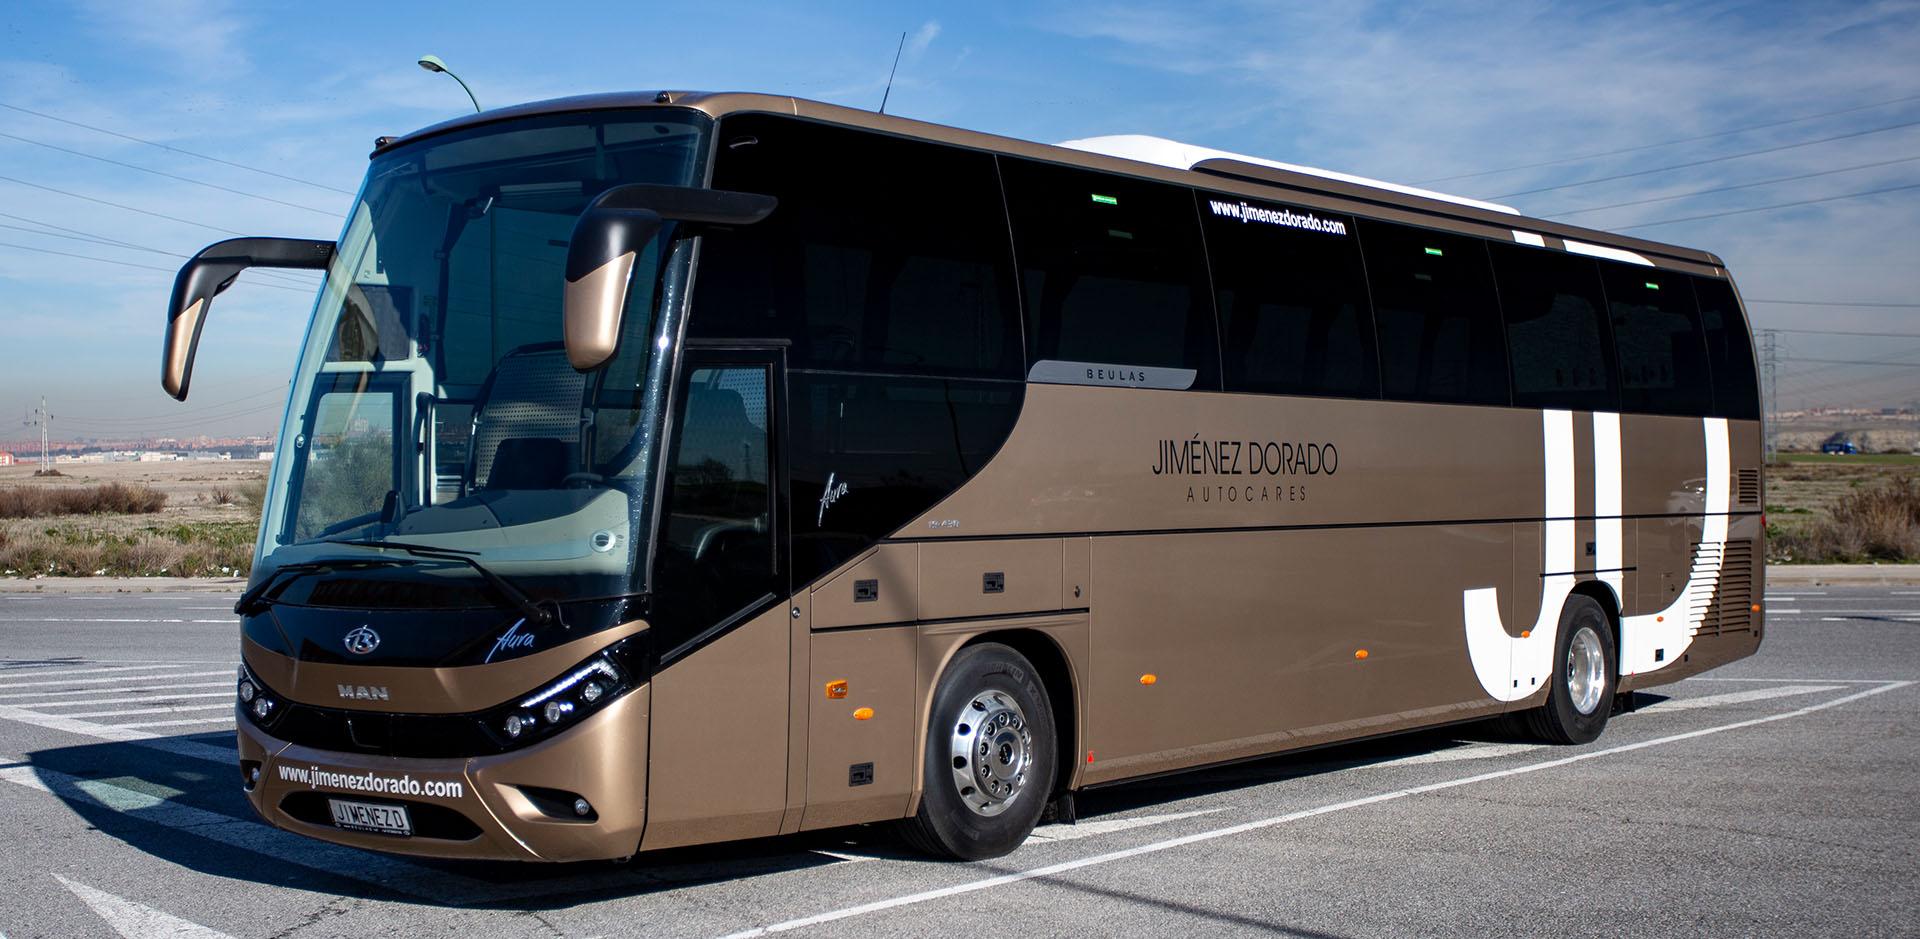 Jimenez Dorado, How To Get From Madrid Airport To Avila - All Possible Ways